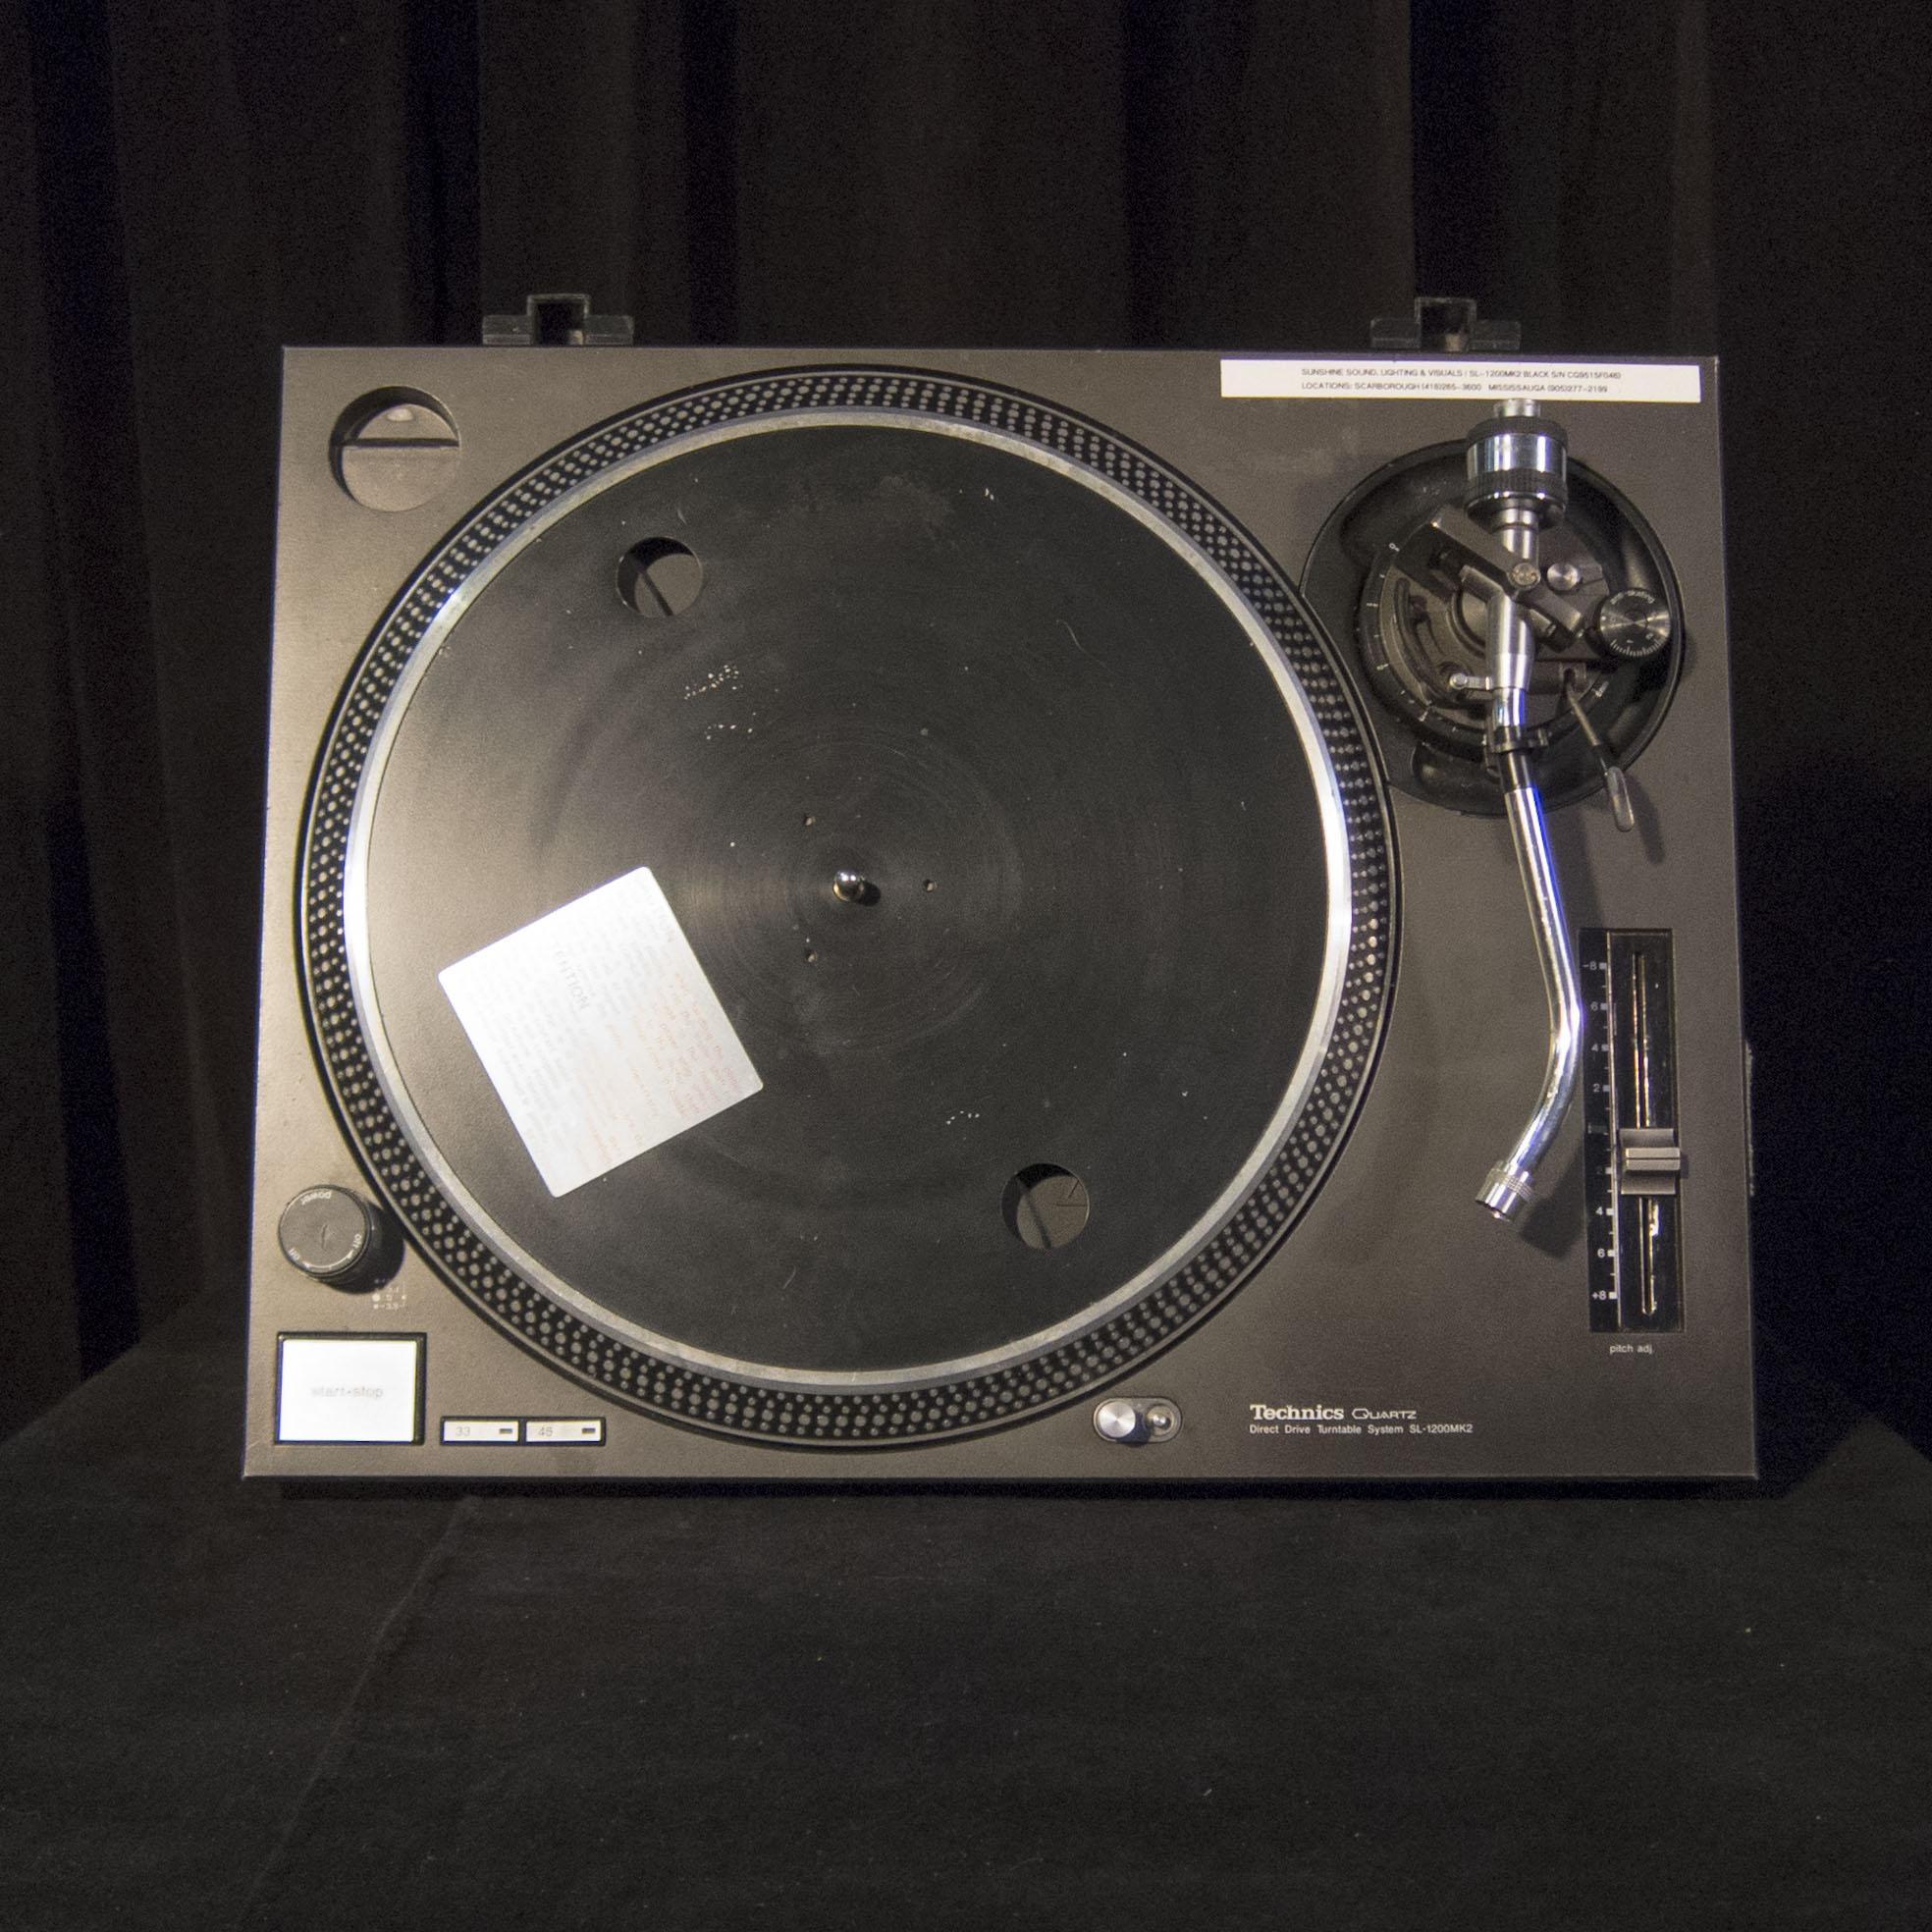 Technics 1200 MK2